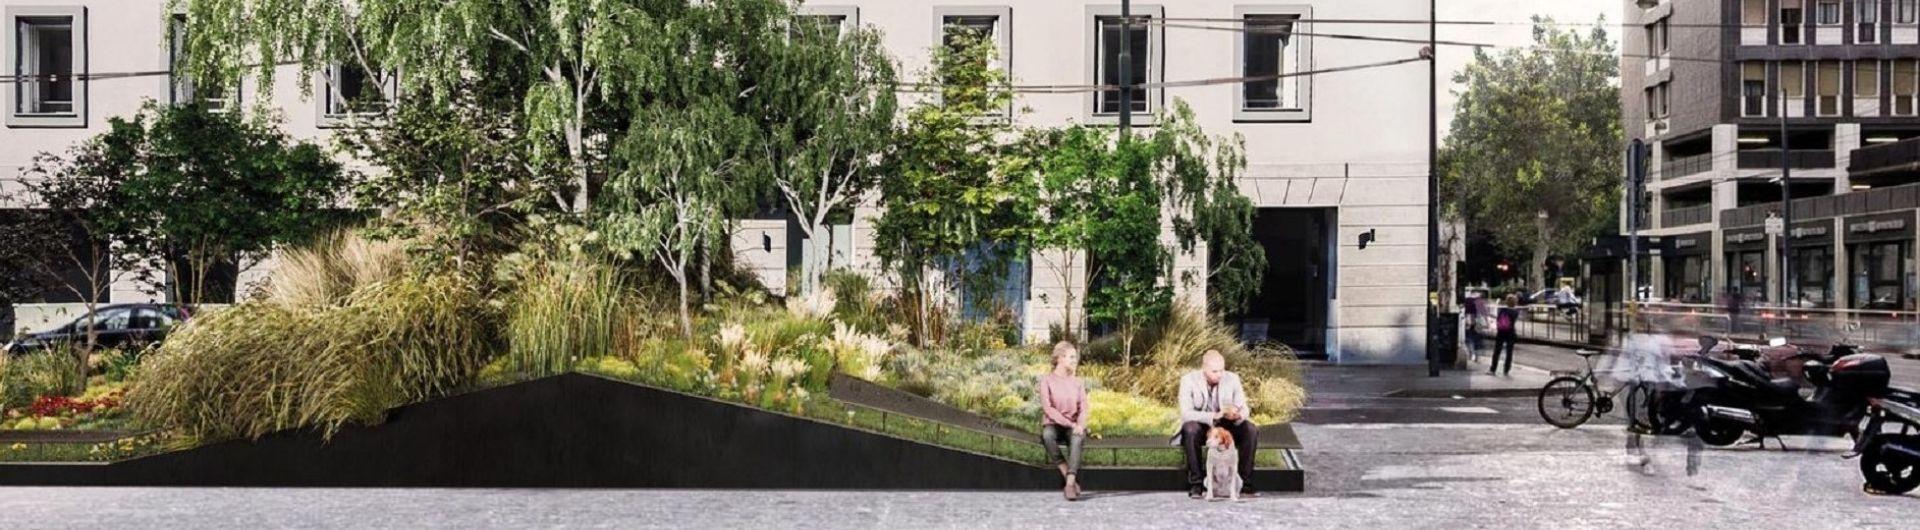 Metalco Superverde - solution de végétalisation urbaine